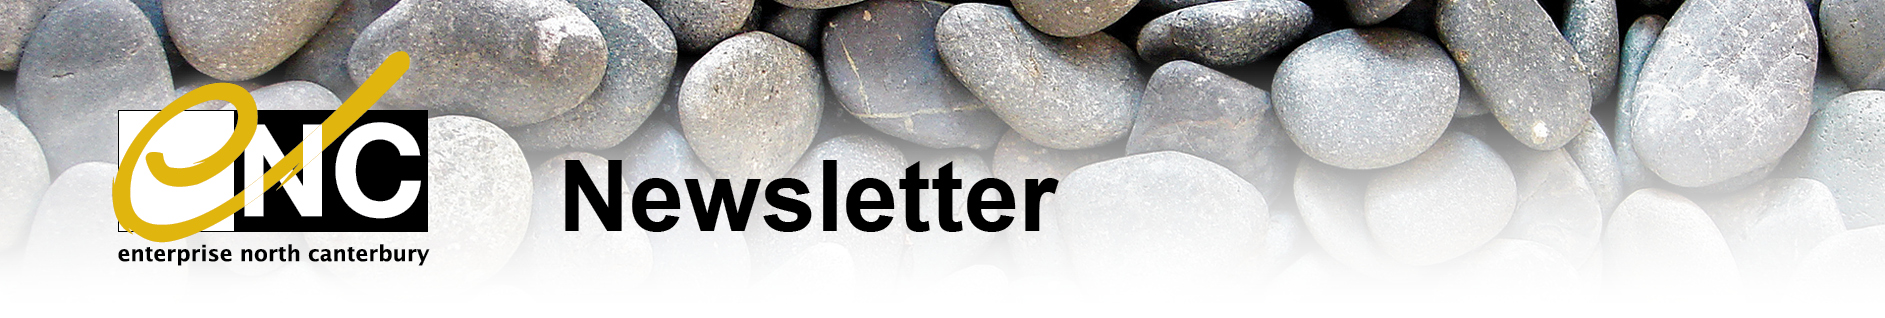 https://campaign-image.com/zohocampaigns/338309000000187039_zc_v1_newsletter_stones_header.jpg